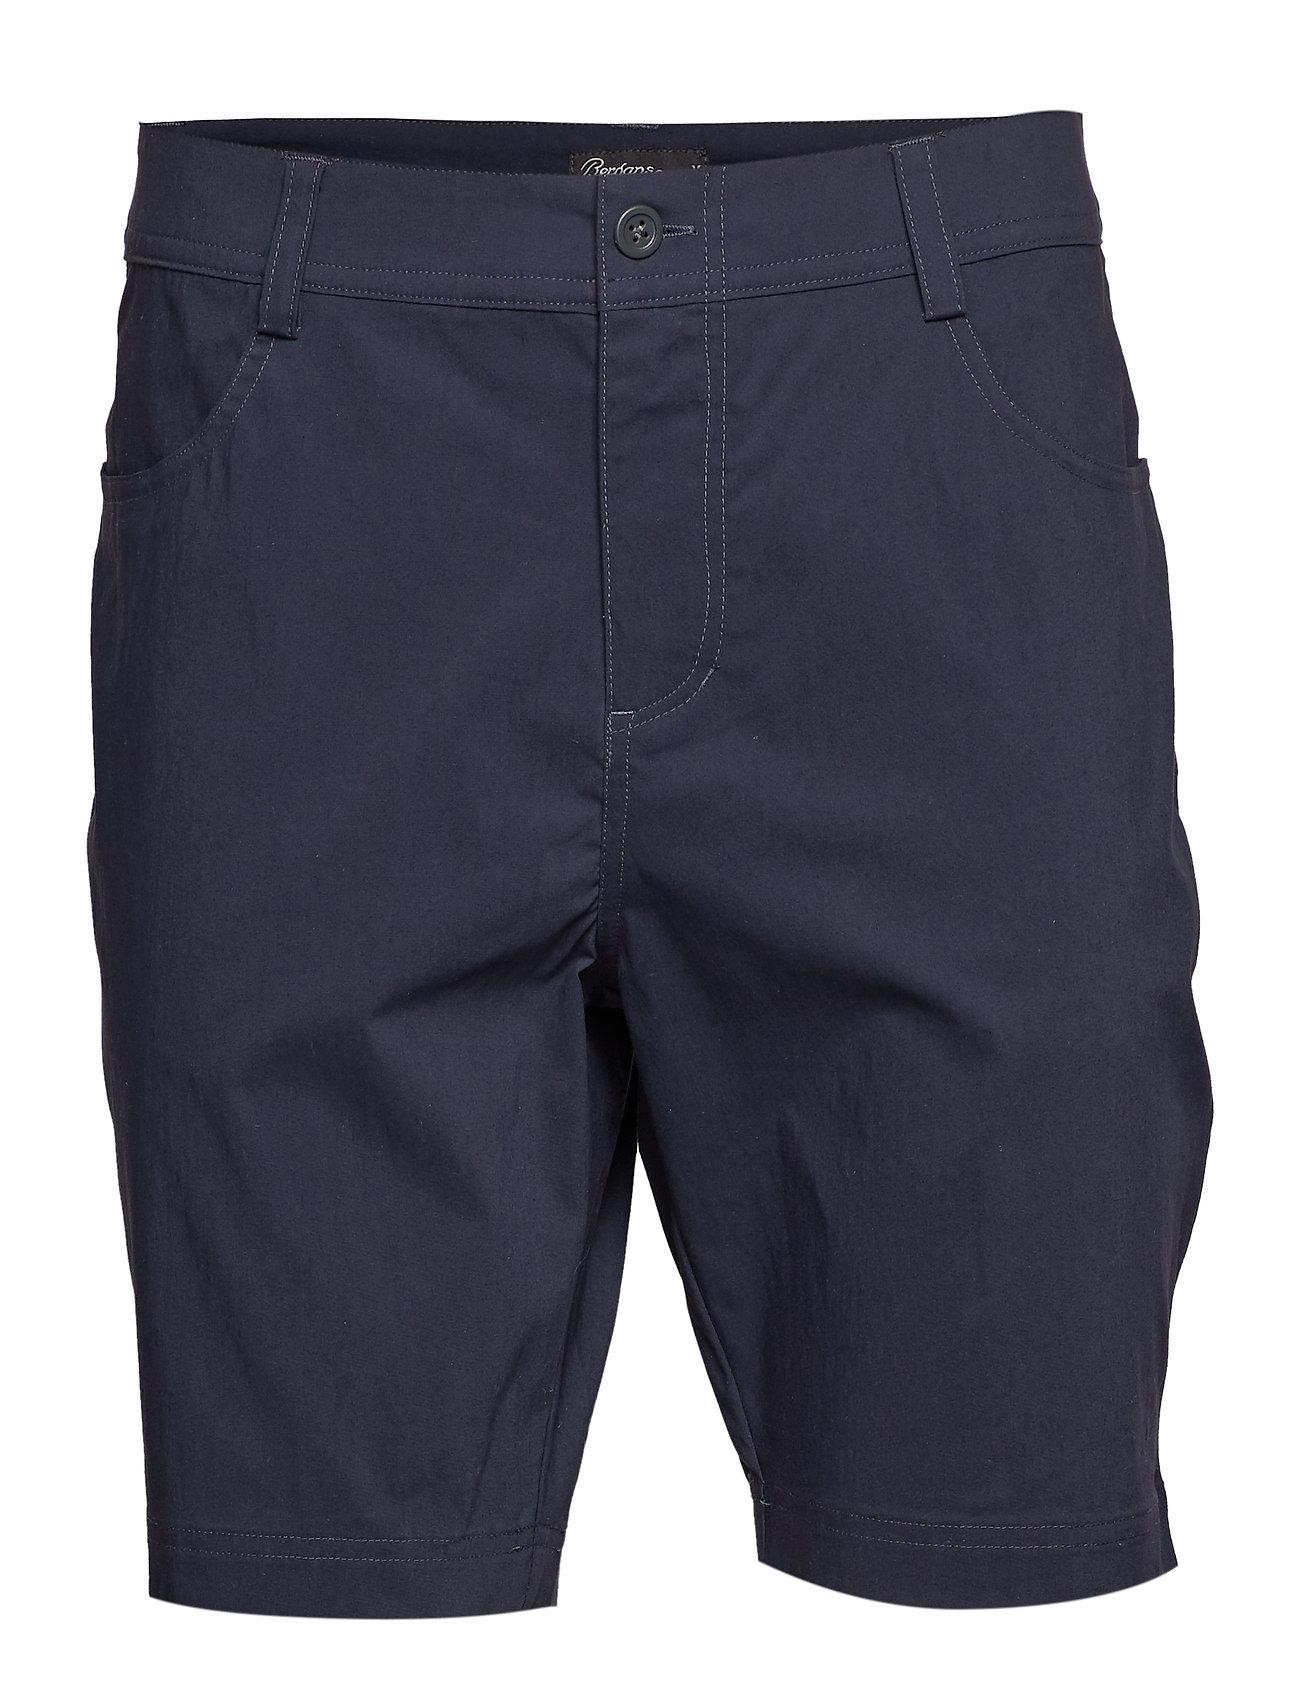 Bergans Oslo Shorts - DK NAVY